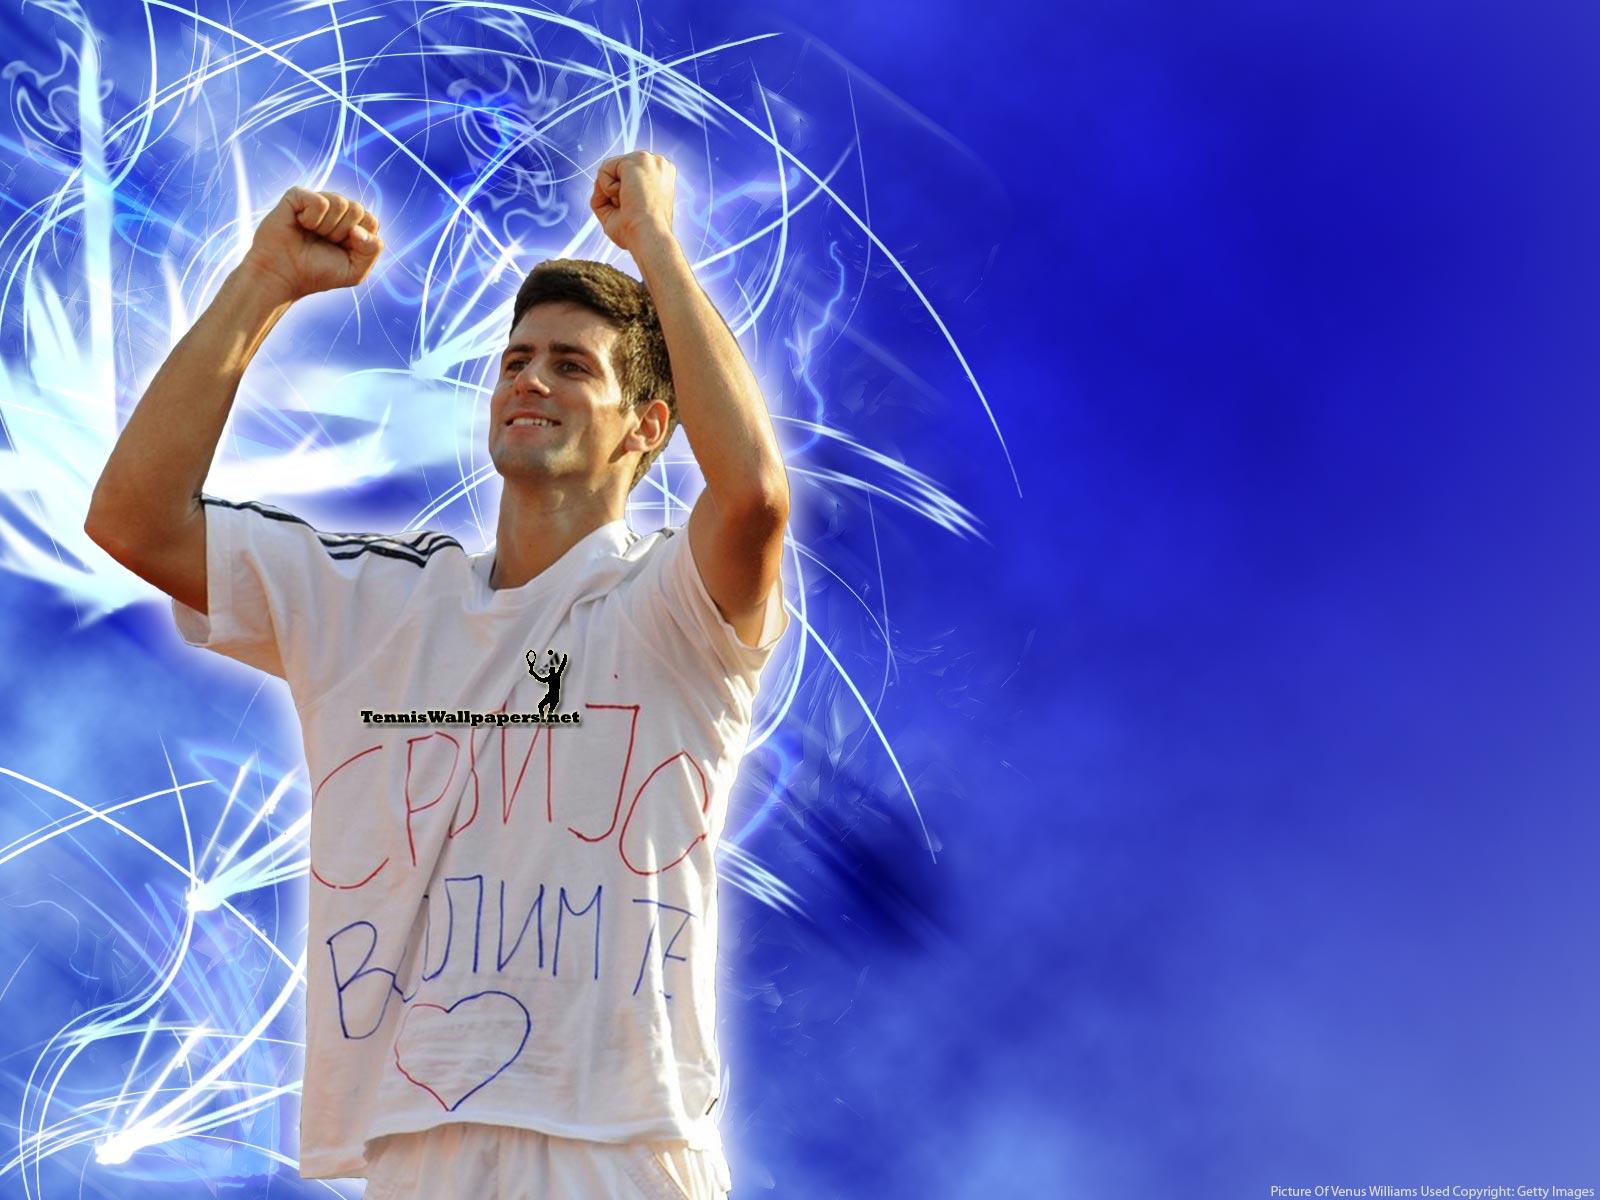 http://1.bp.blogspot.com/__c9qWlUD8Qs/S793id6uTLI/AAAAAAAAEw0/ro_PLy9LiN4/s1600/Novak-Djokovic-Serbia-Open-2009-Wallpaper.jpg